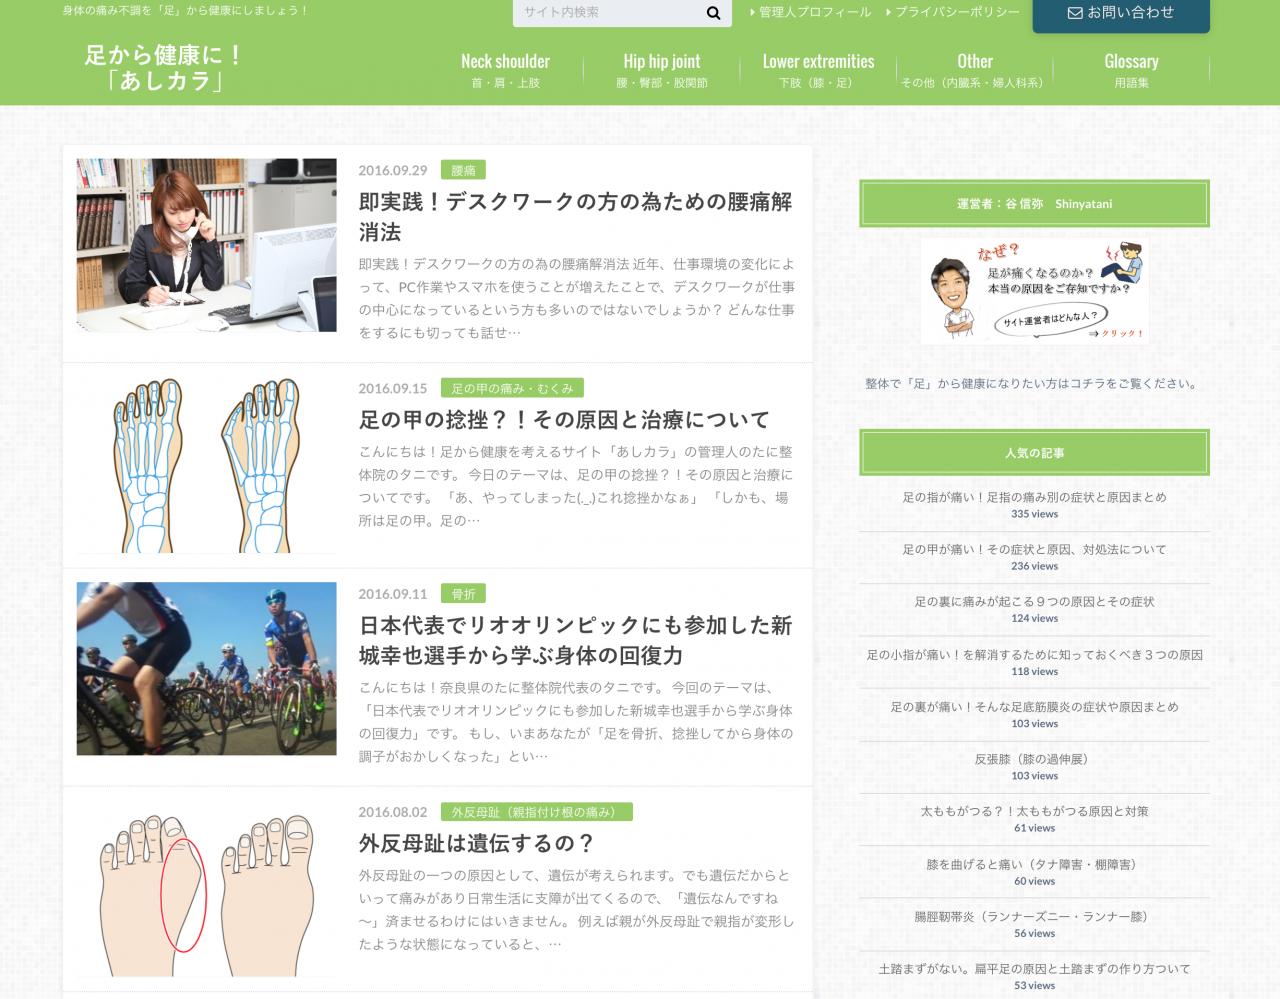 screencapture-asikara-net-1476765740332